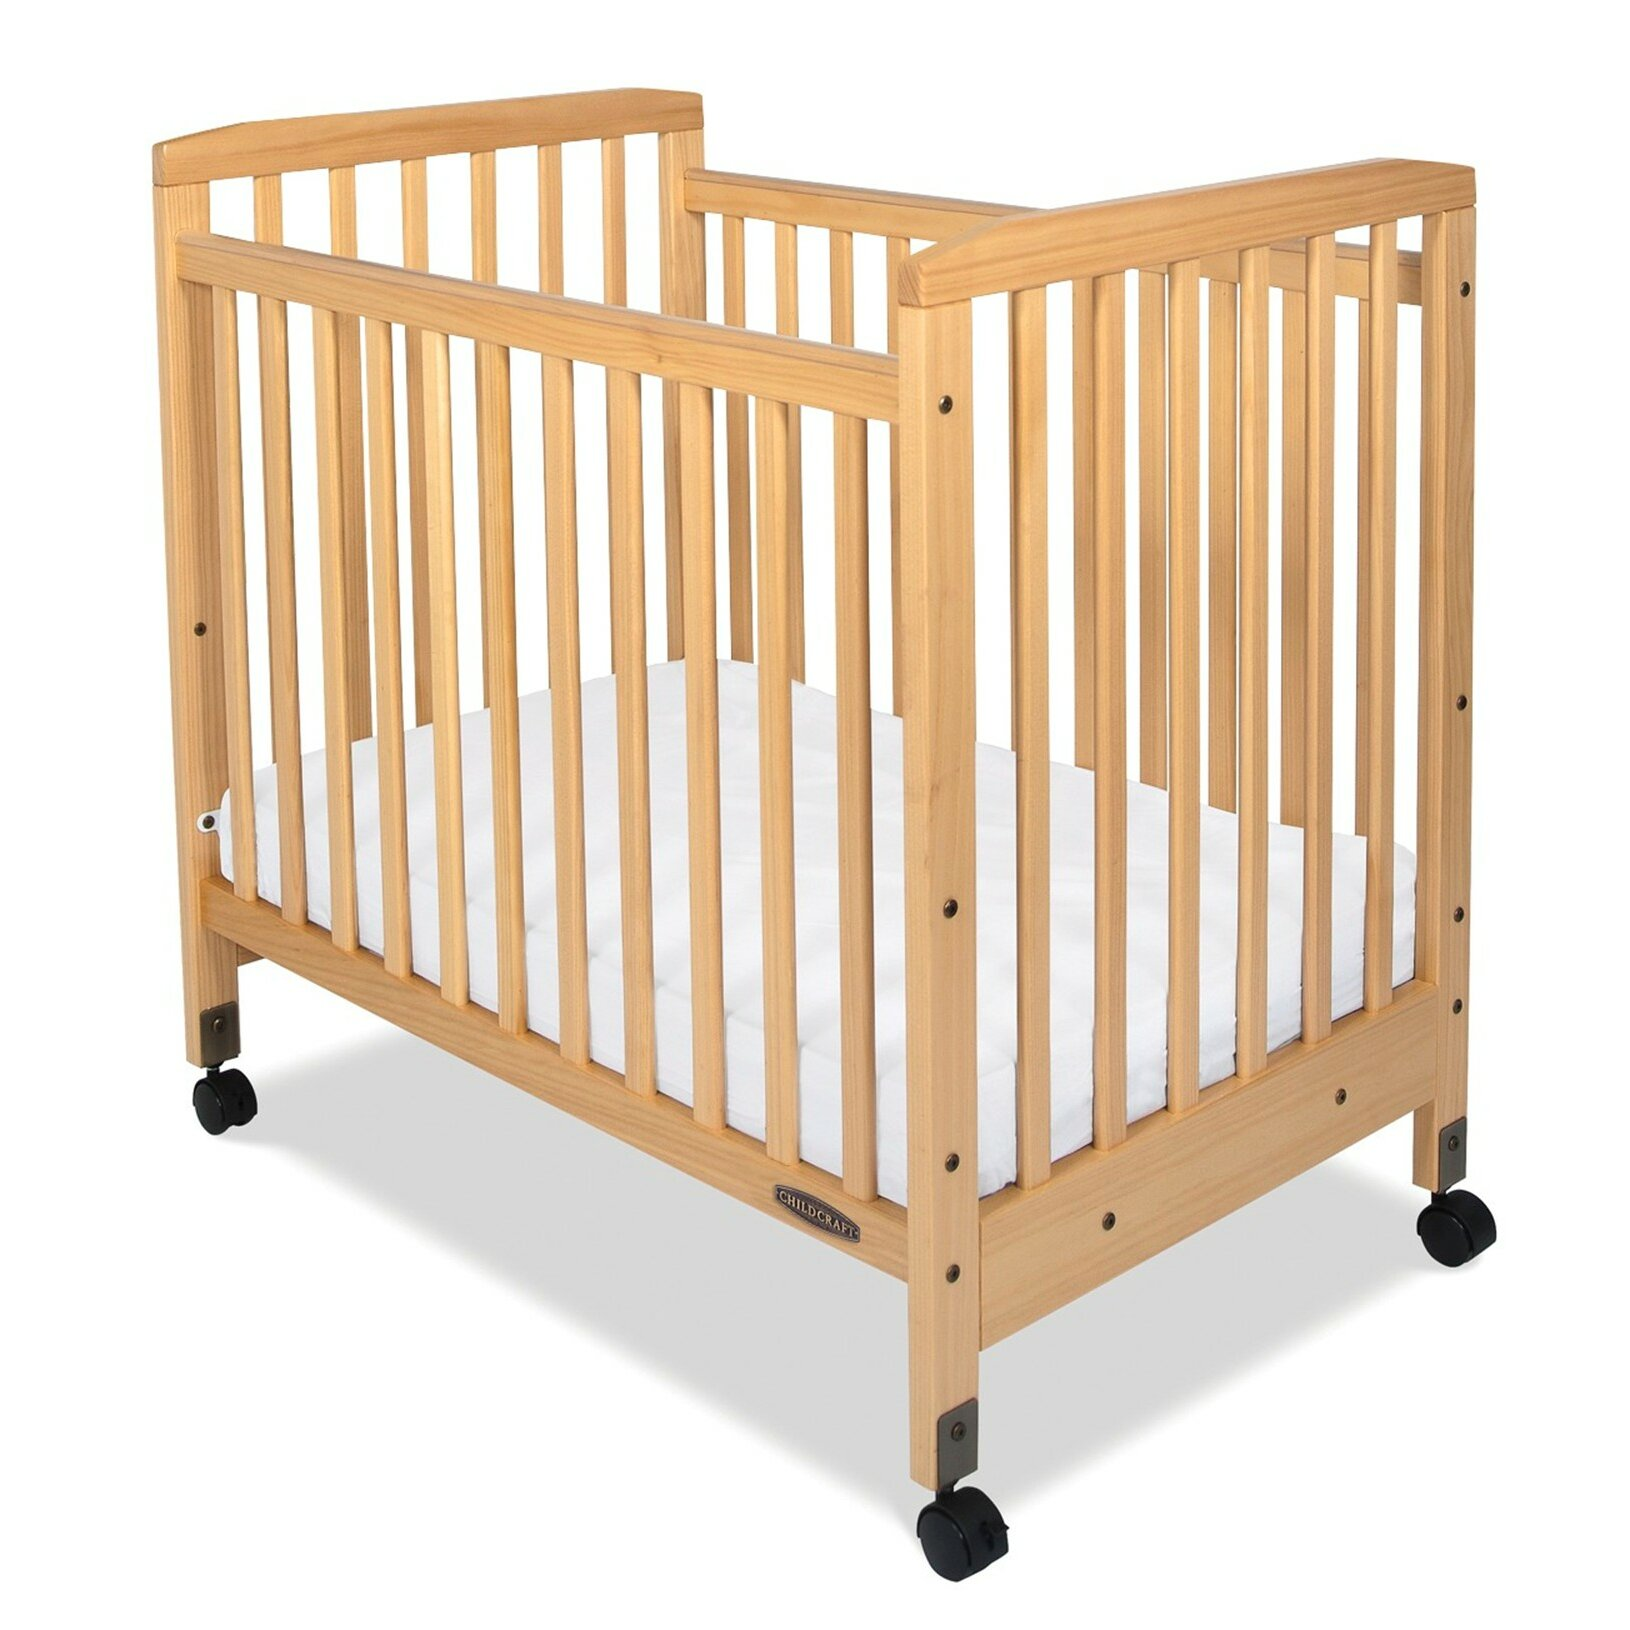 Evacuation crib for sale - Child Craft Bristol Professional Series Compact Child Care Crib With Mattress